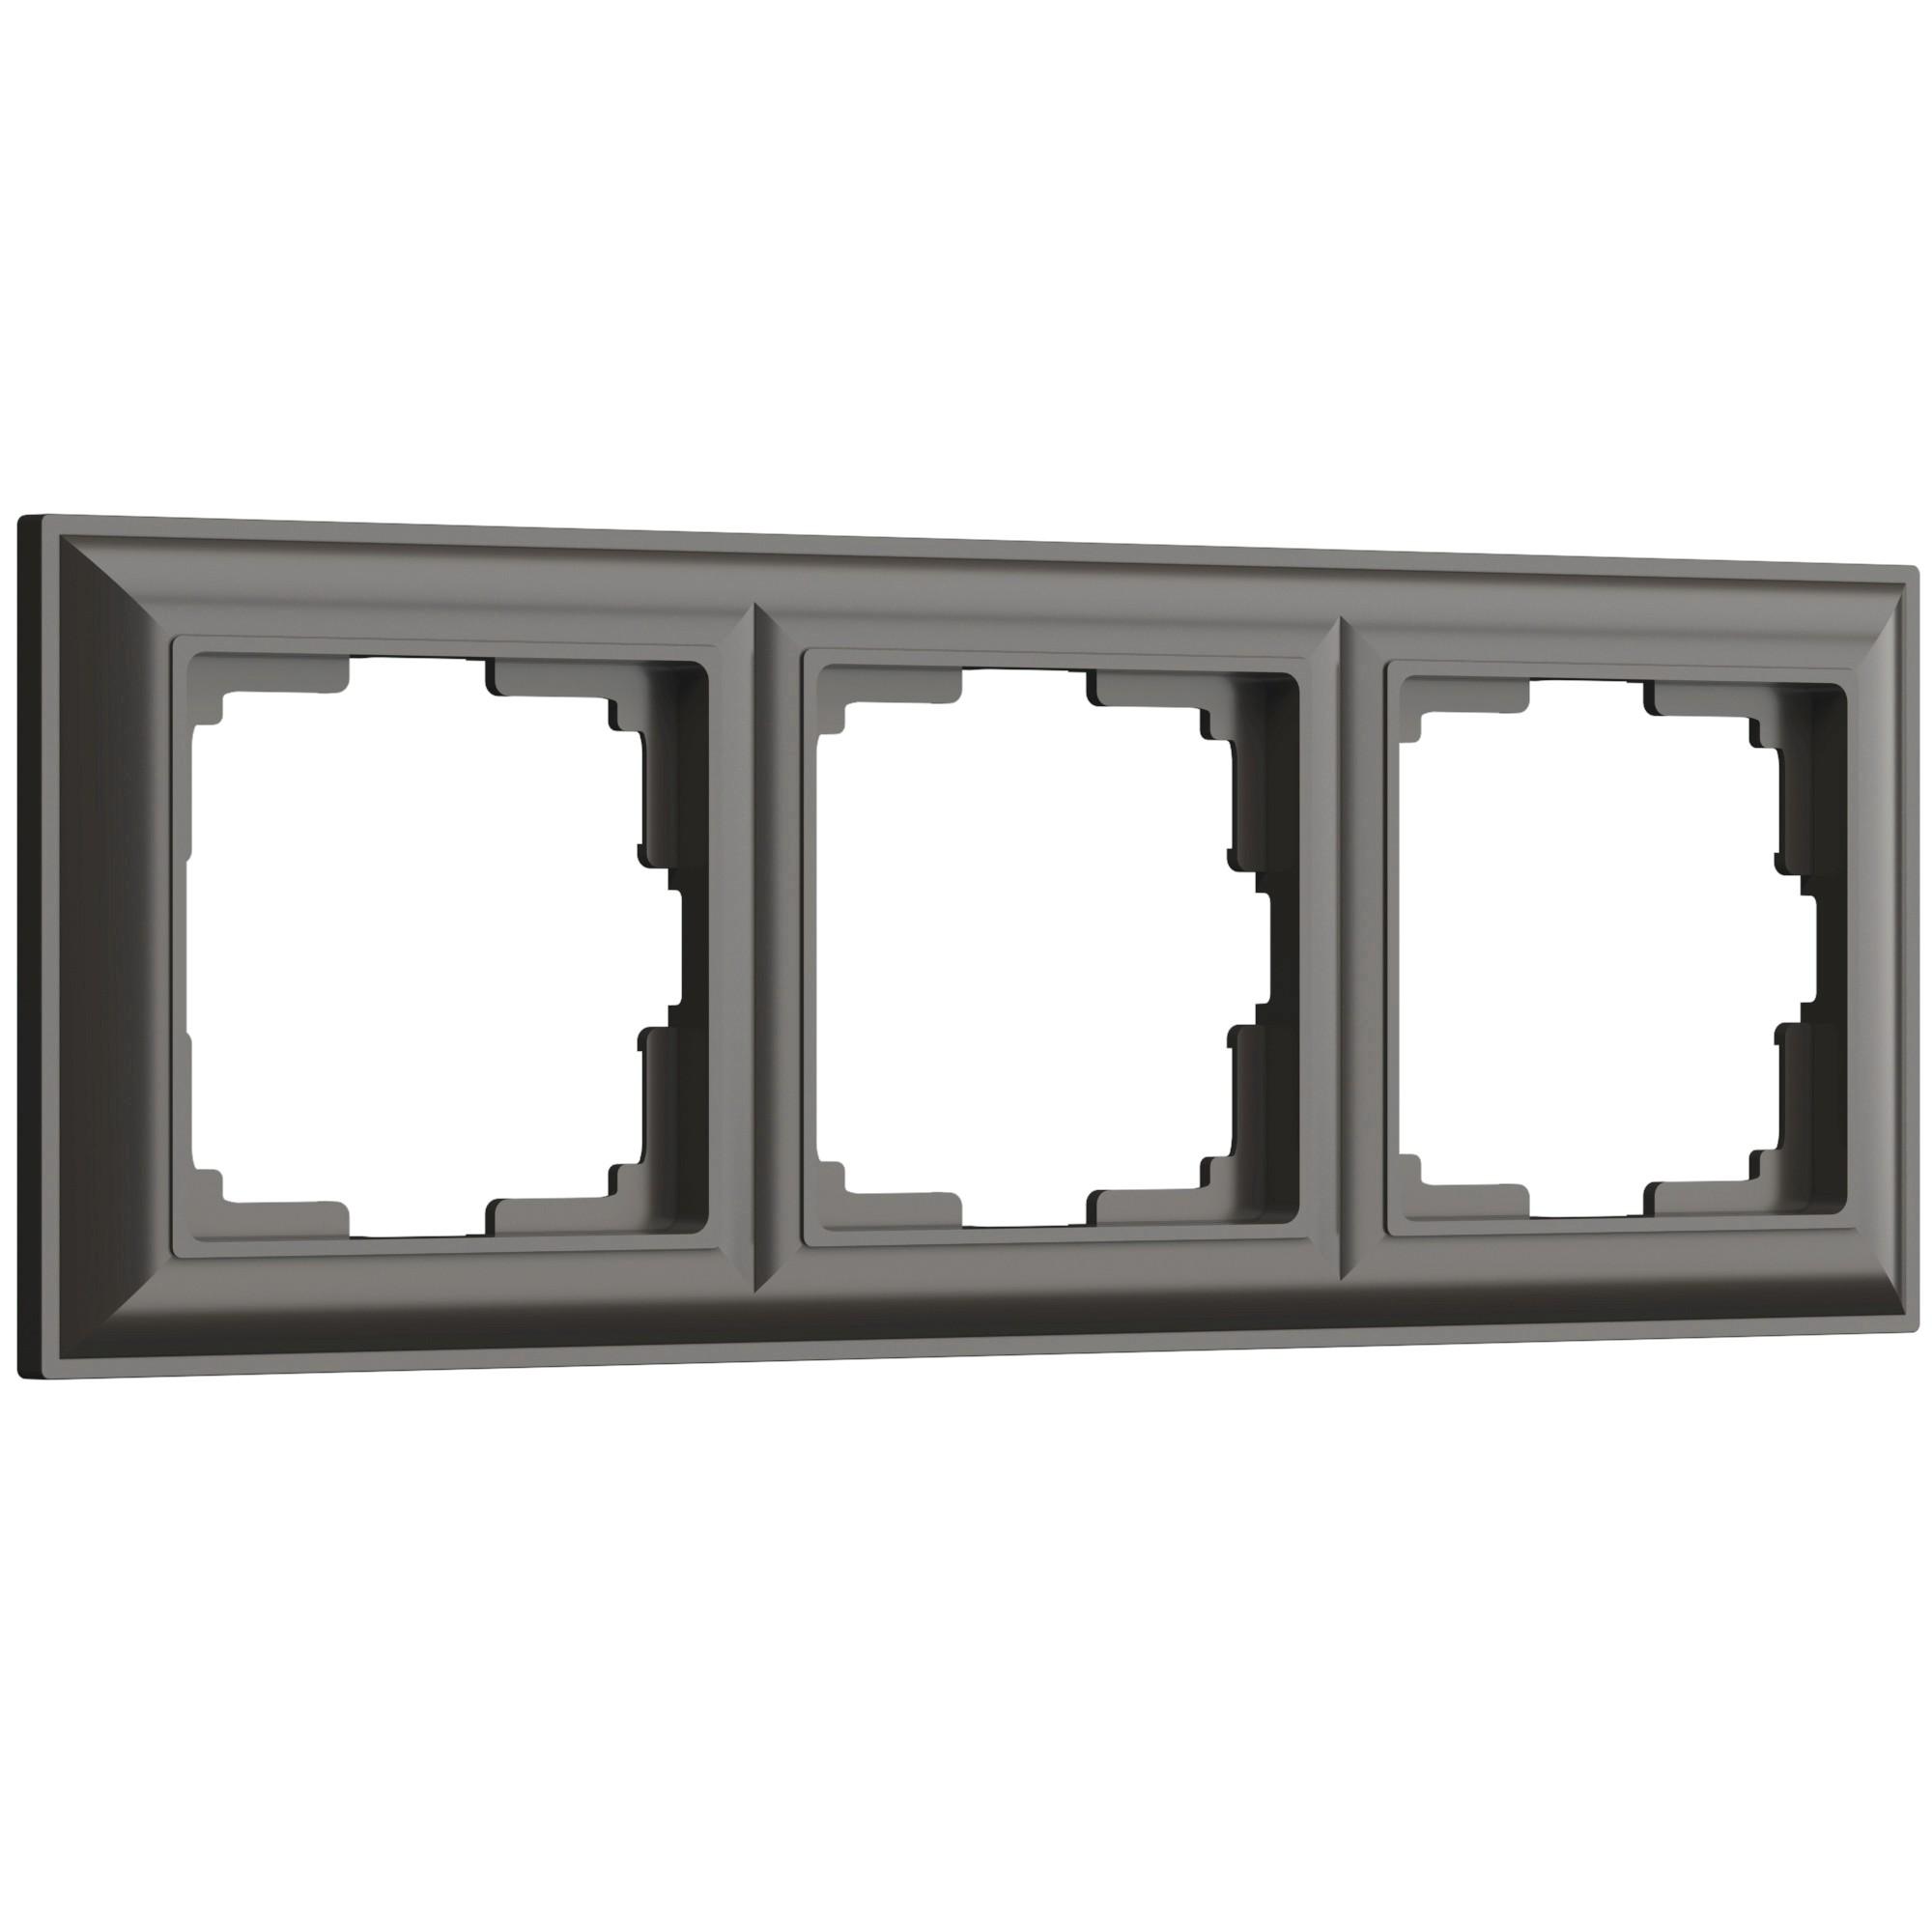 WL14-Frame-03/ Рамка на 3 поста (серо-коричневый)